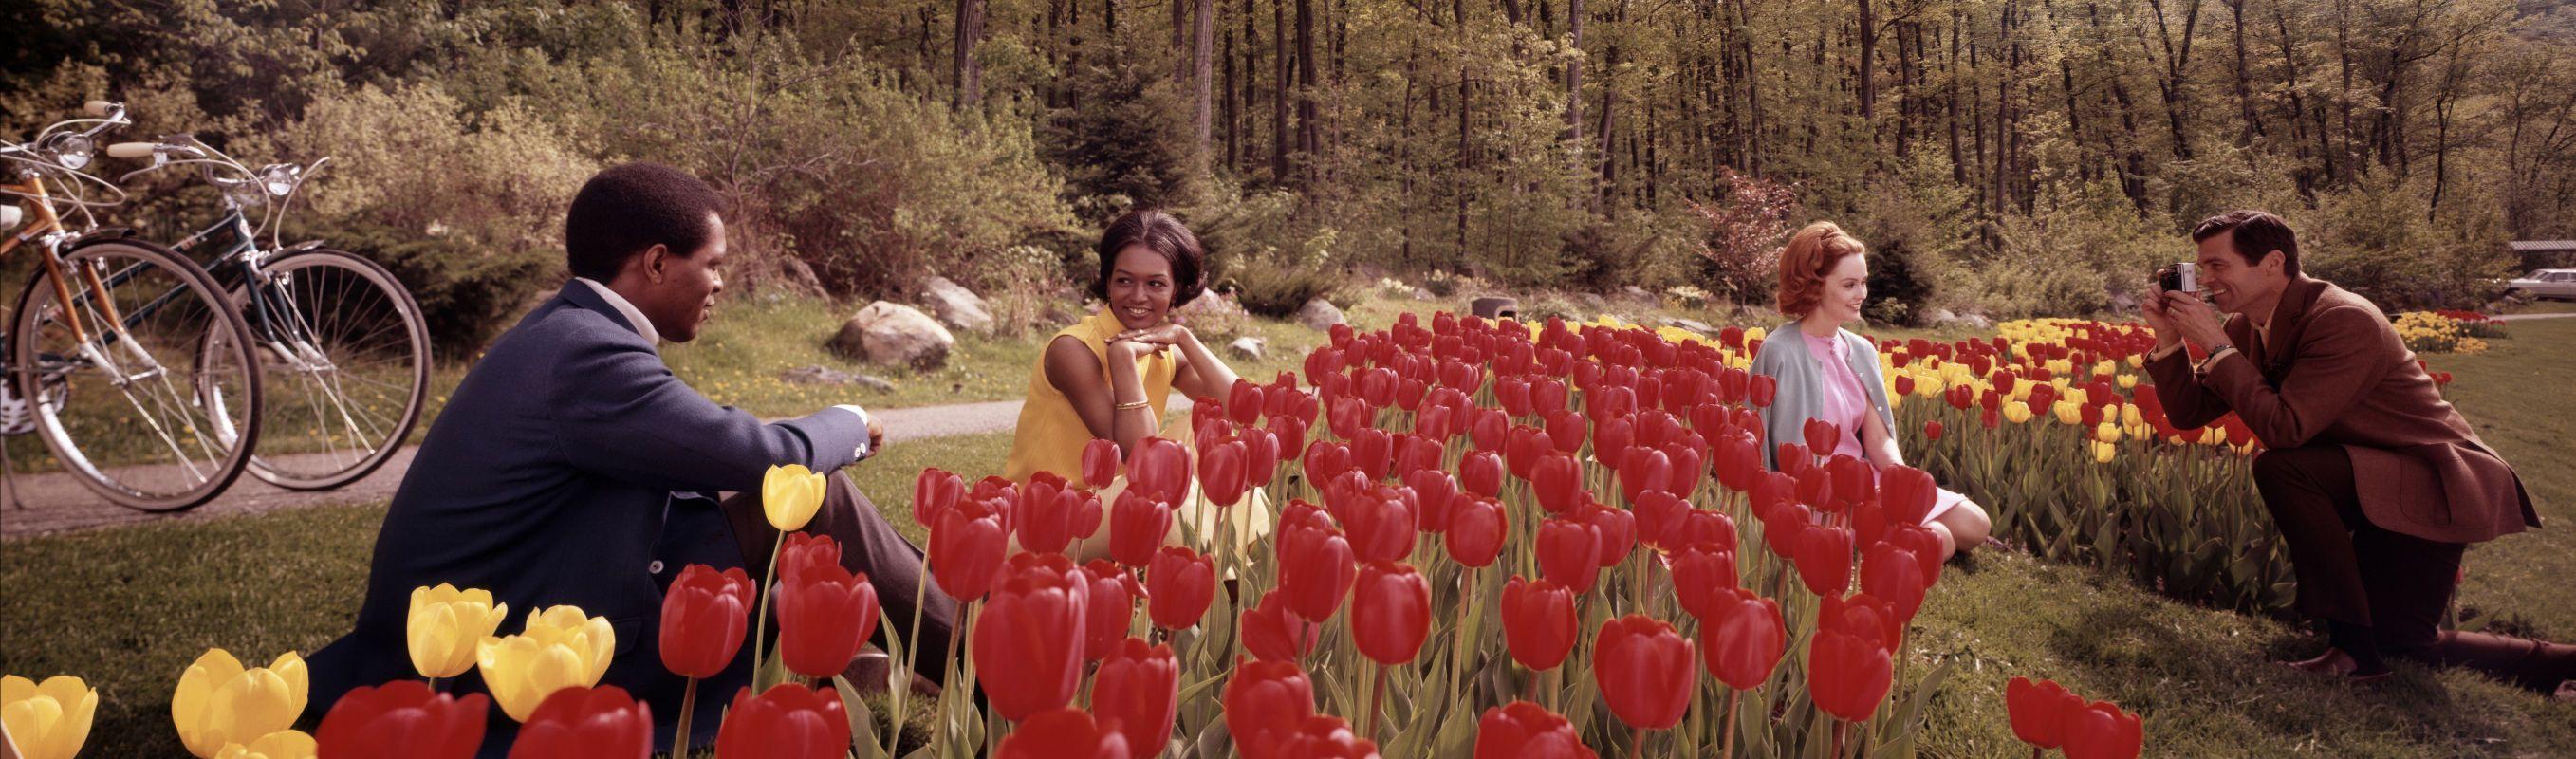 sterling-gardens-tuxedo-new-york-1969-colorma-319-c2bd-kodak-_1.jpg